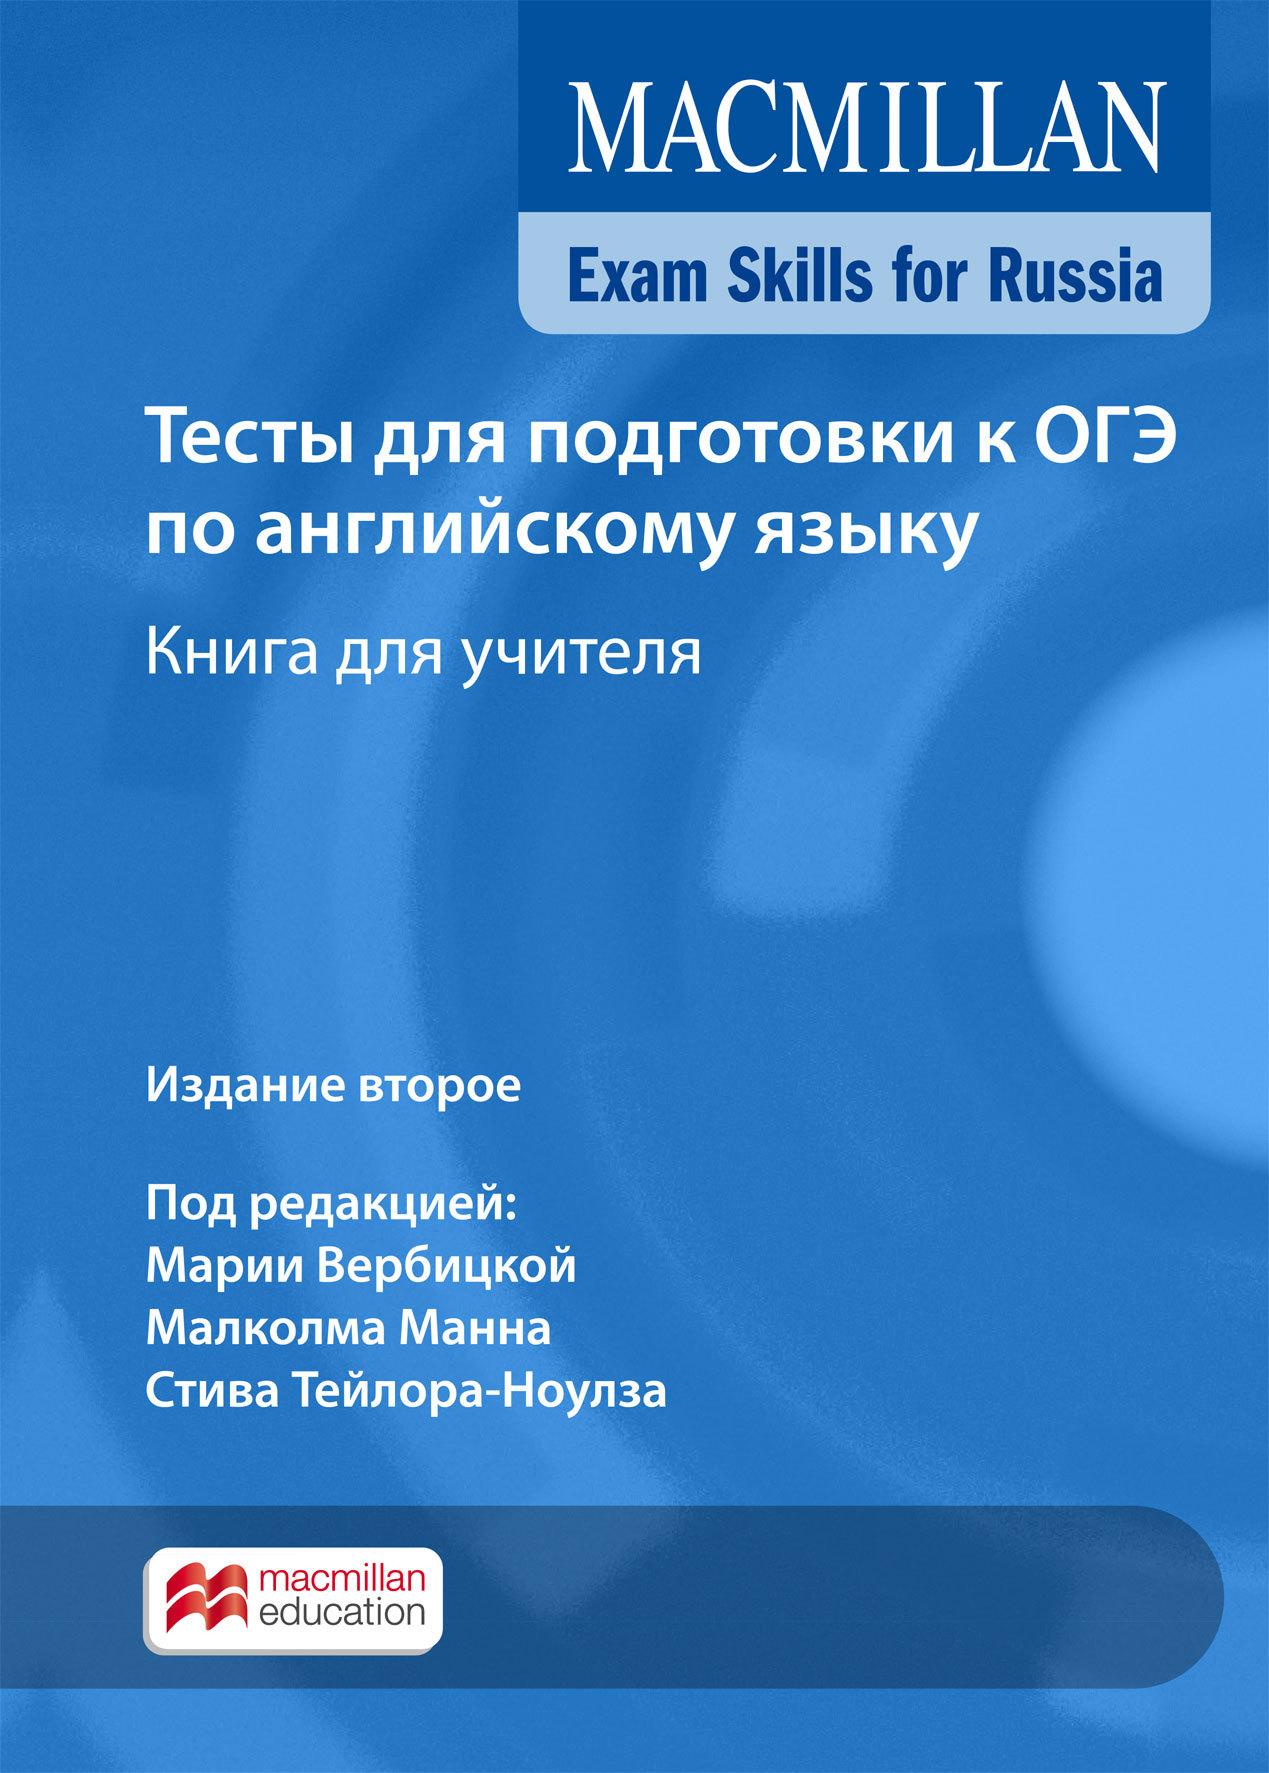 macmillan exam skills for russia ответы издание второе